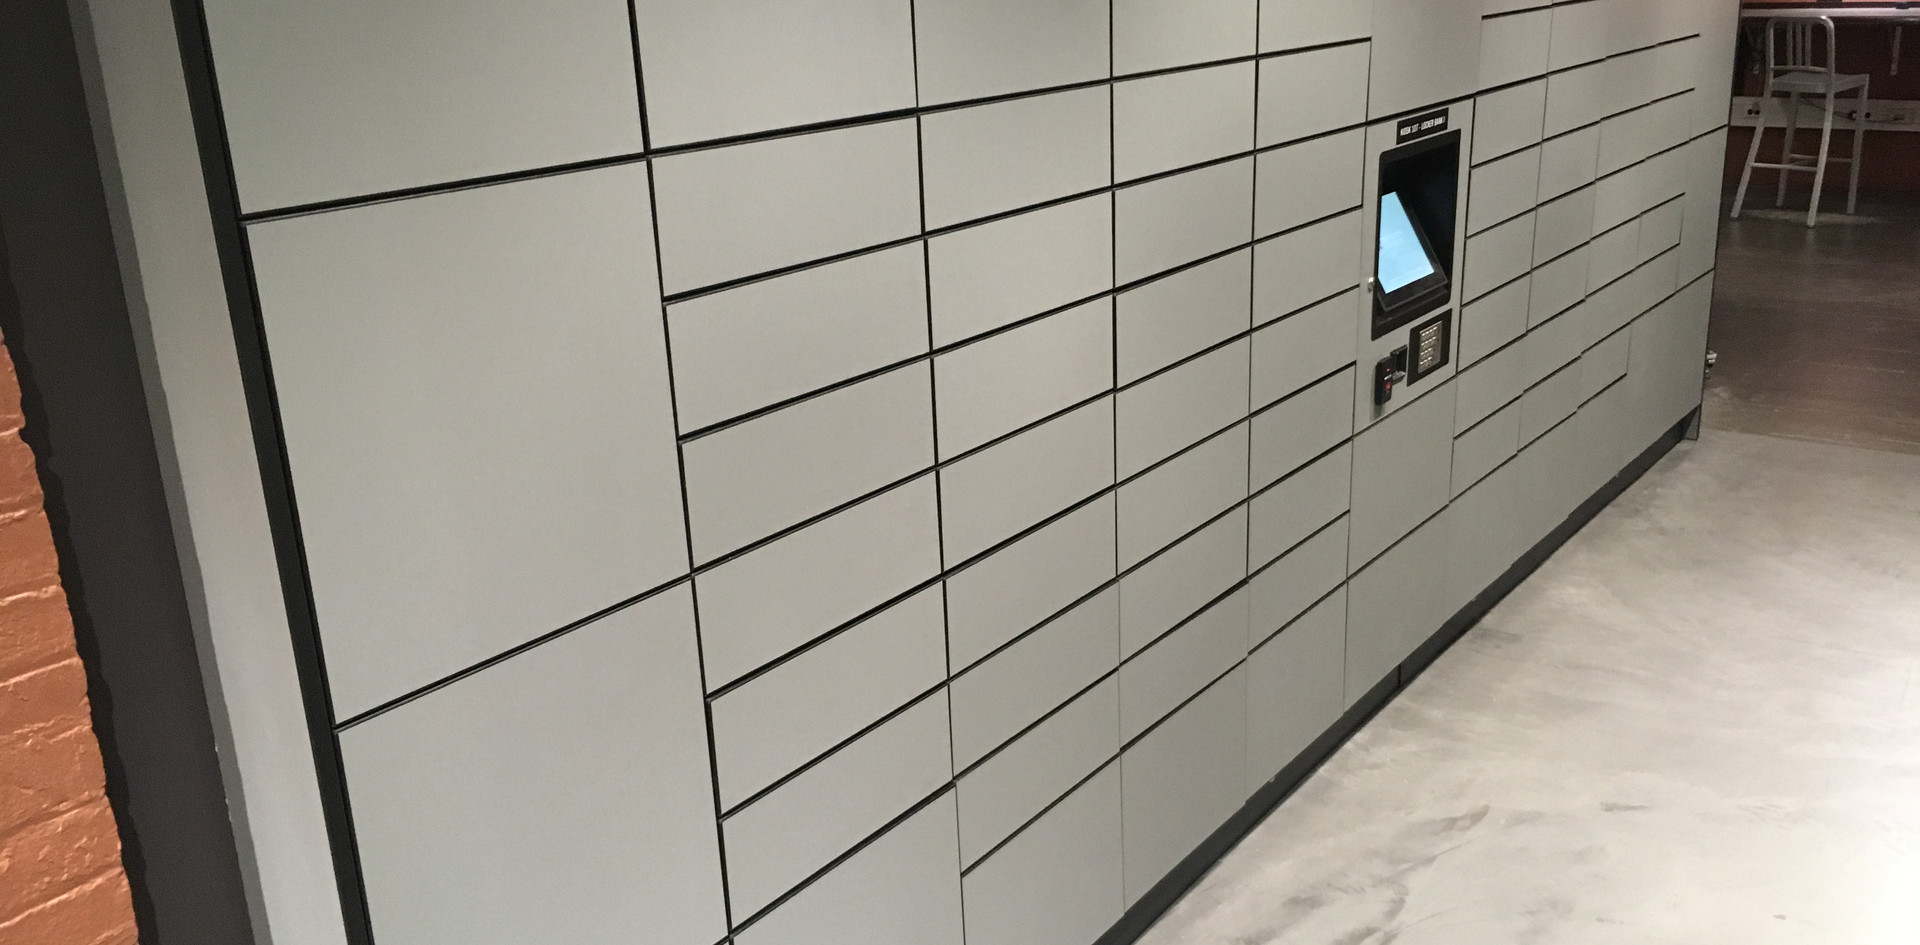 public access parcel pickup lockers screen pc control access